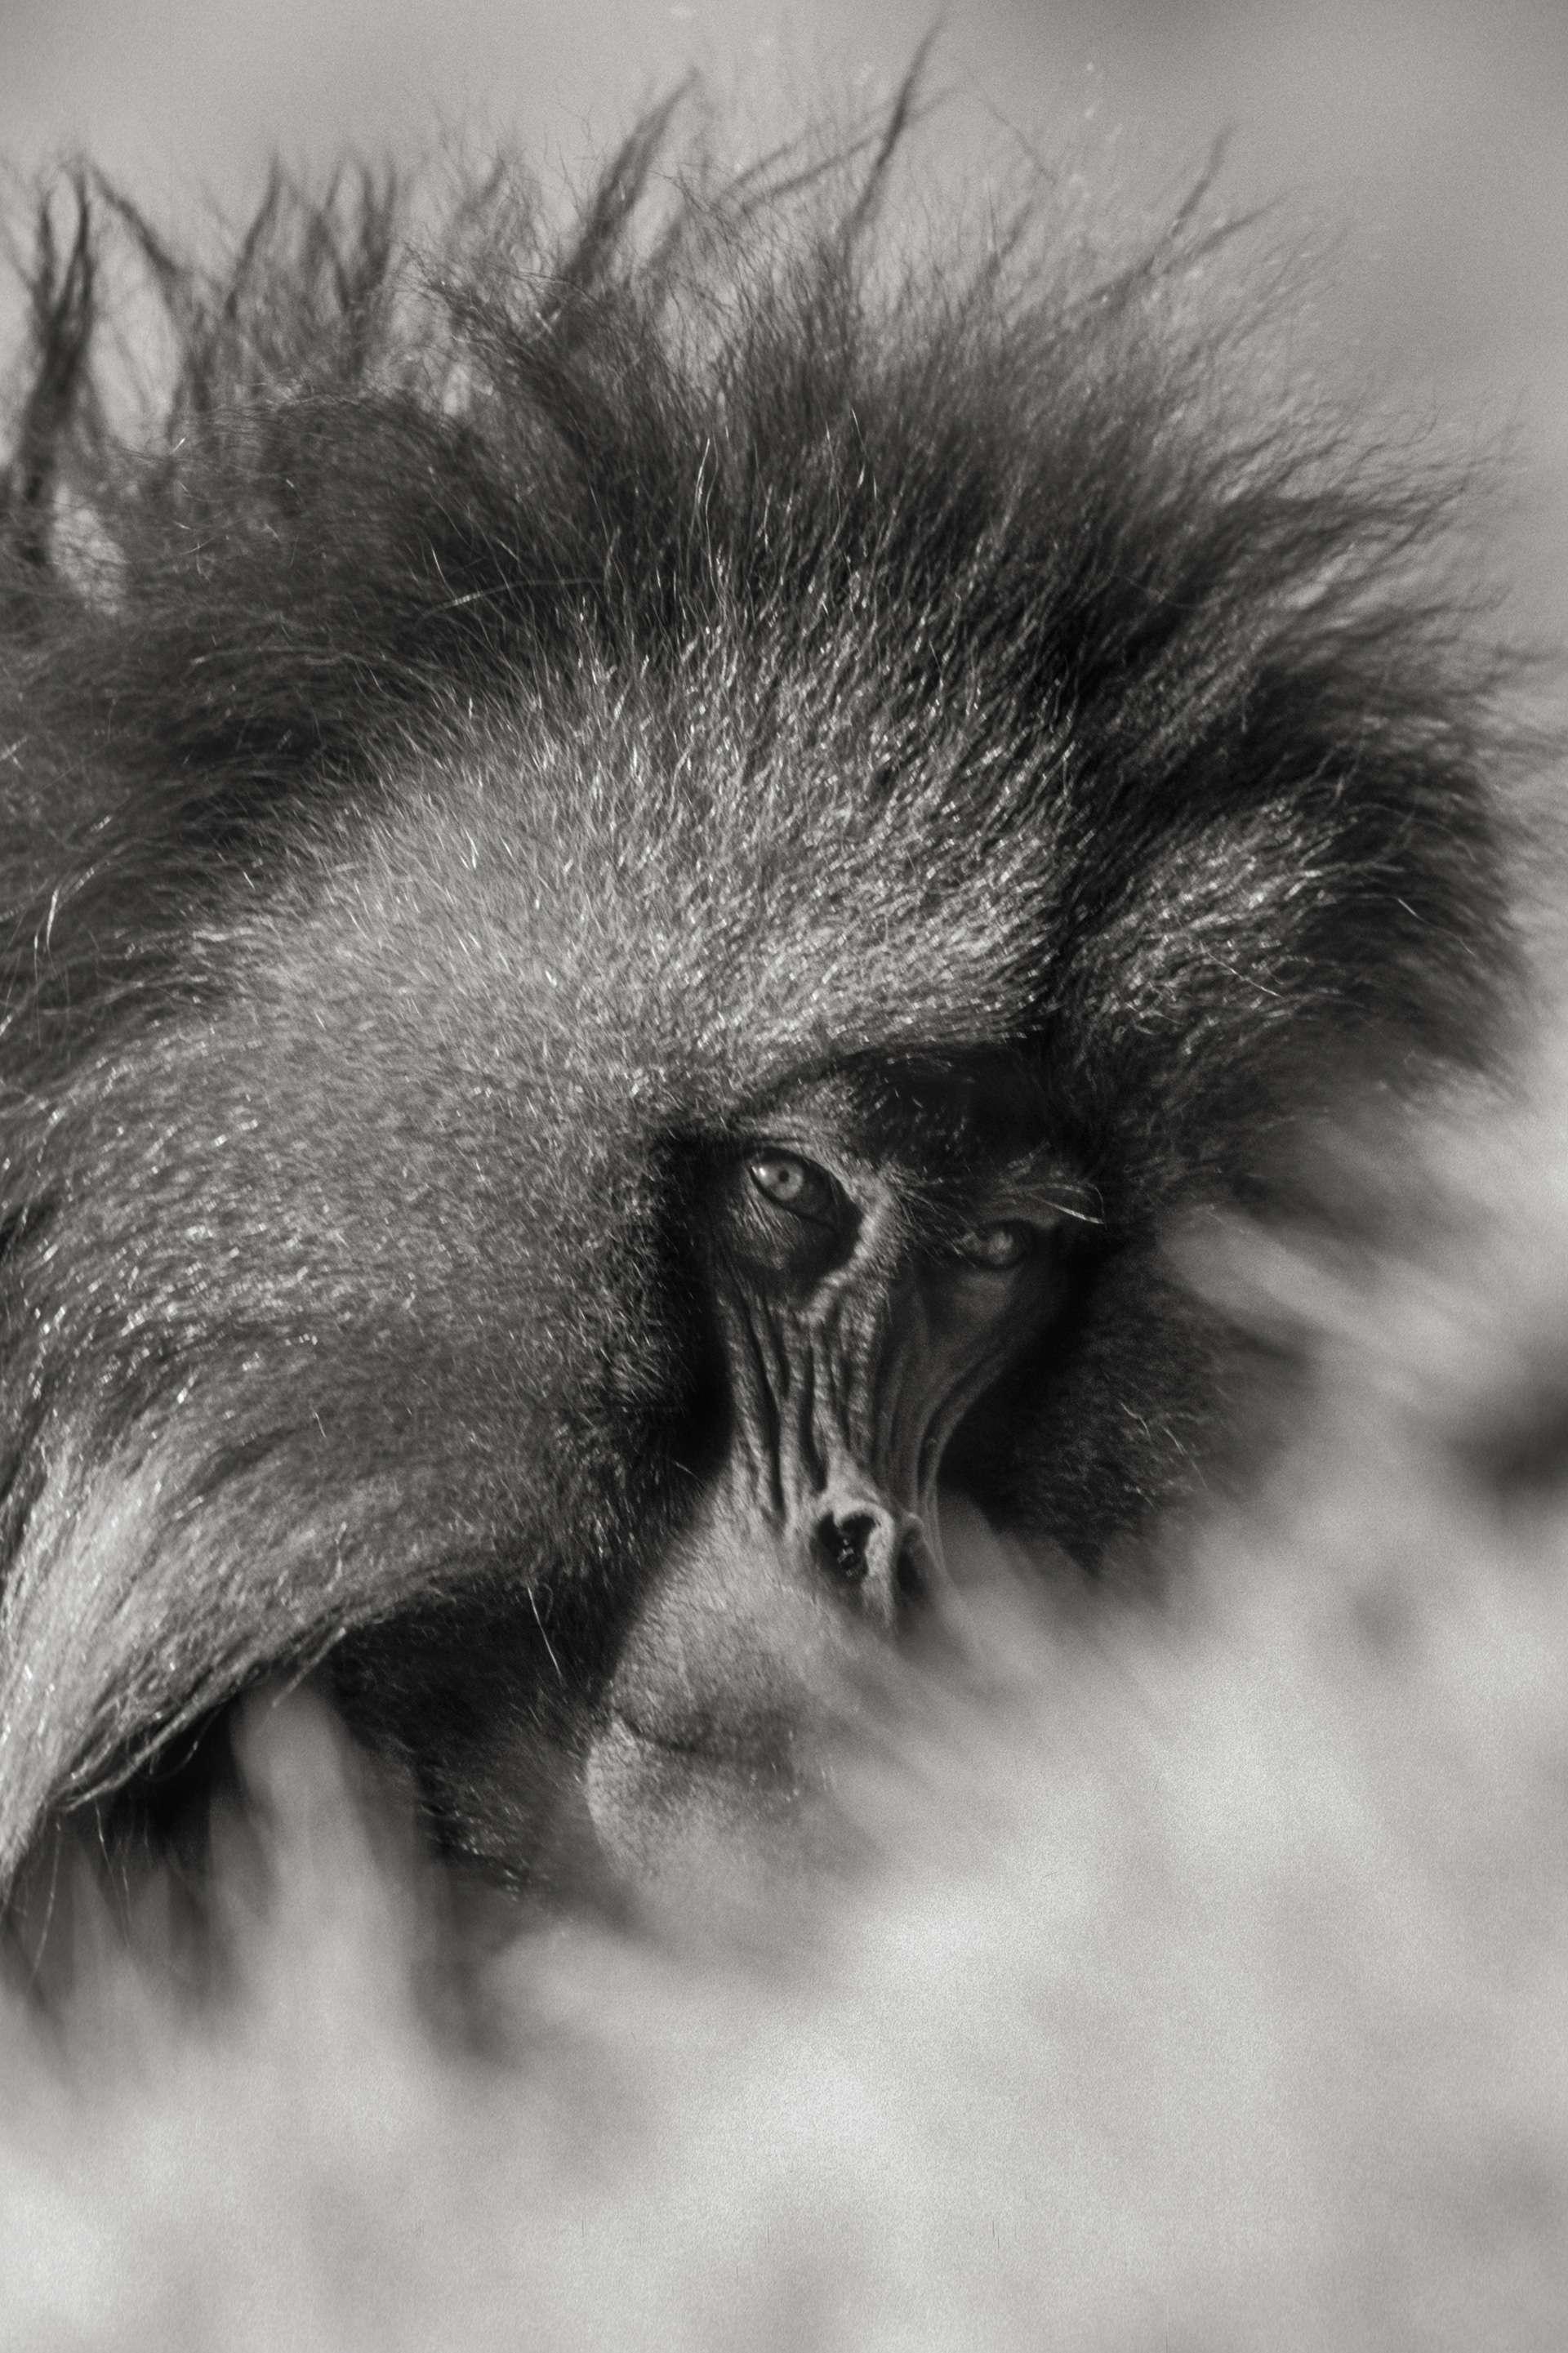 Photographie de Gilles Martin : gélada d'Ethiopie, Struggle for life